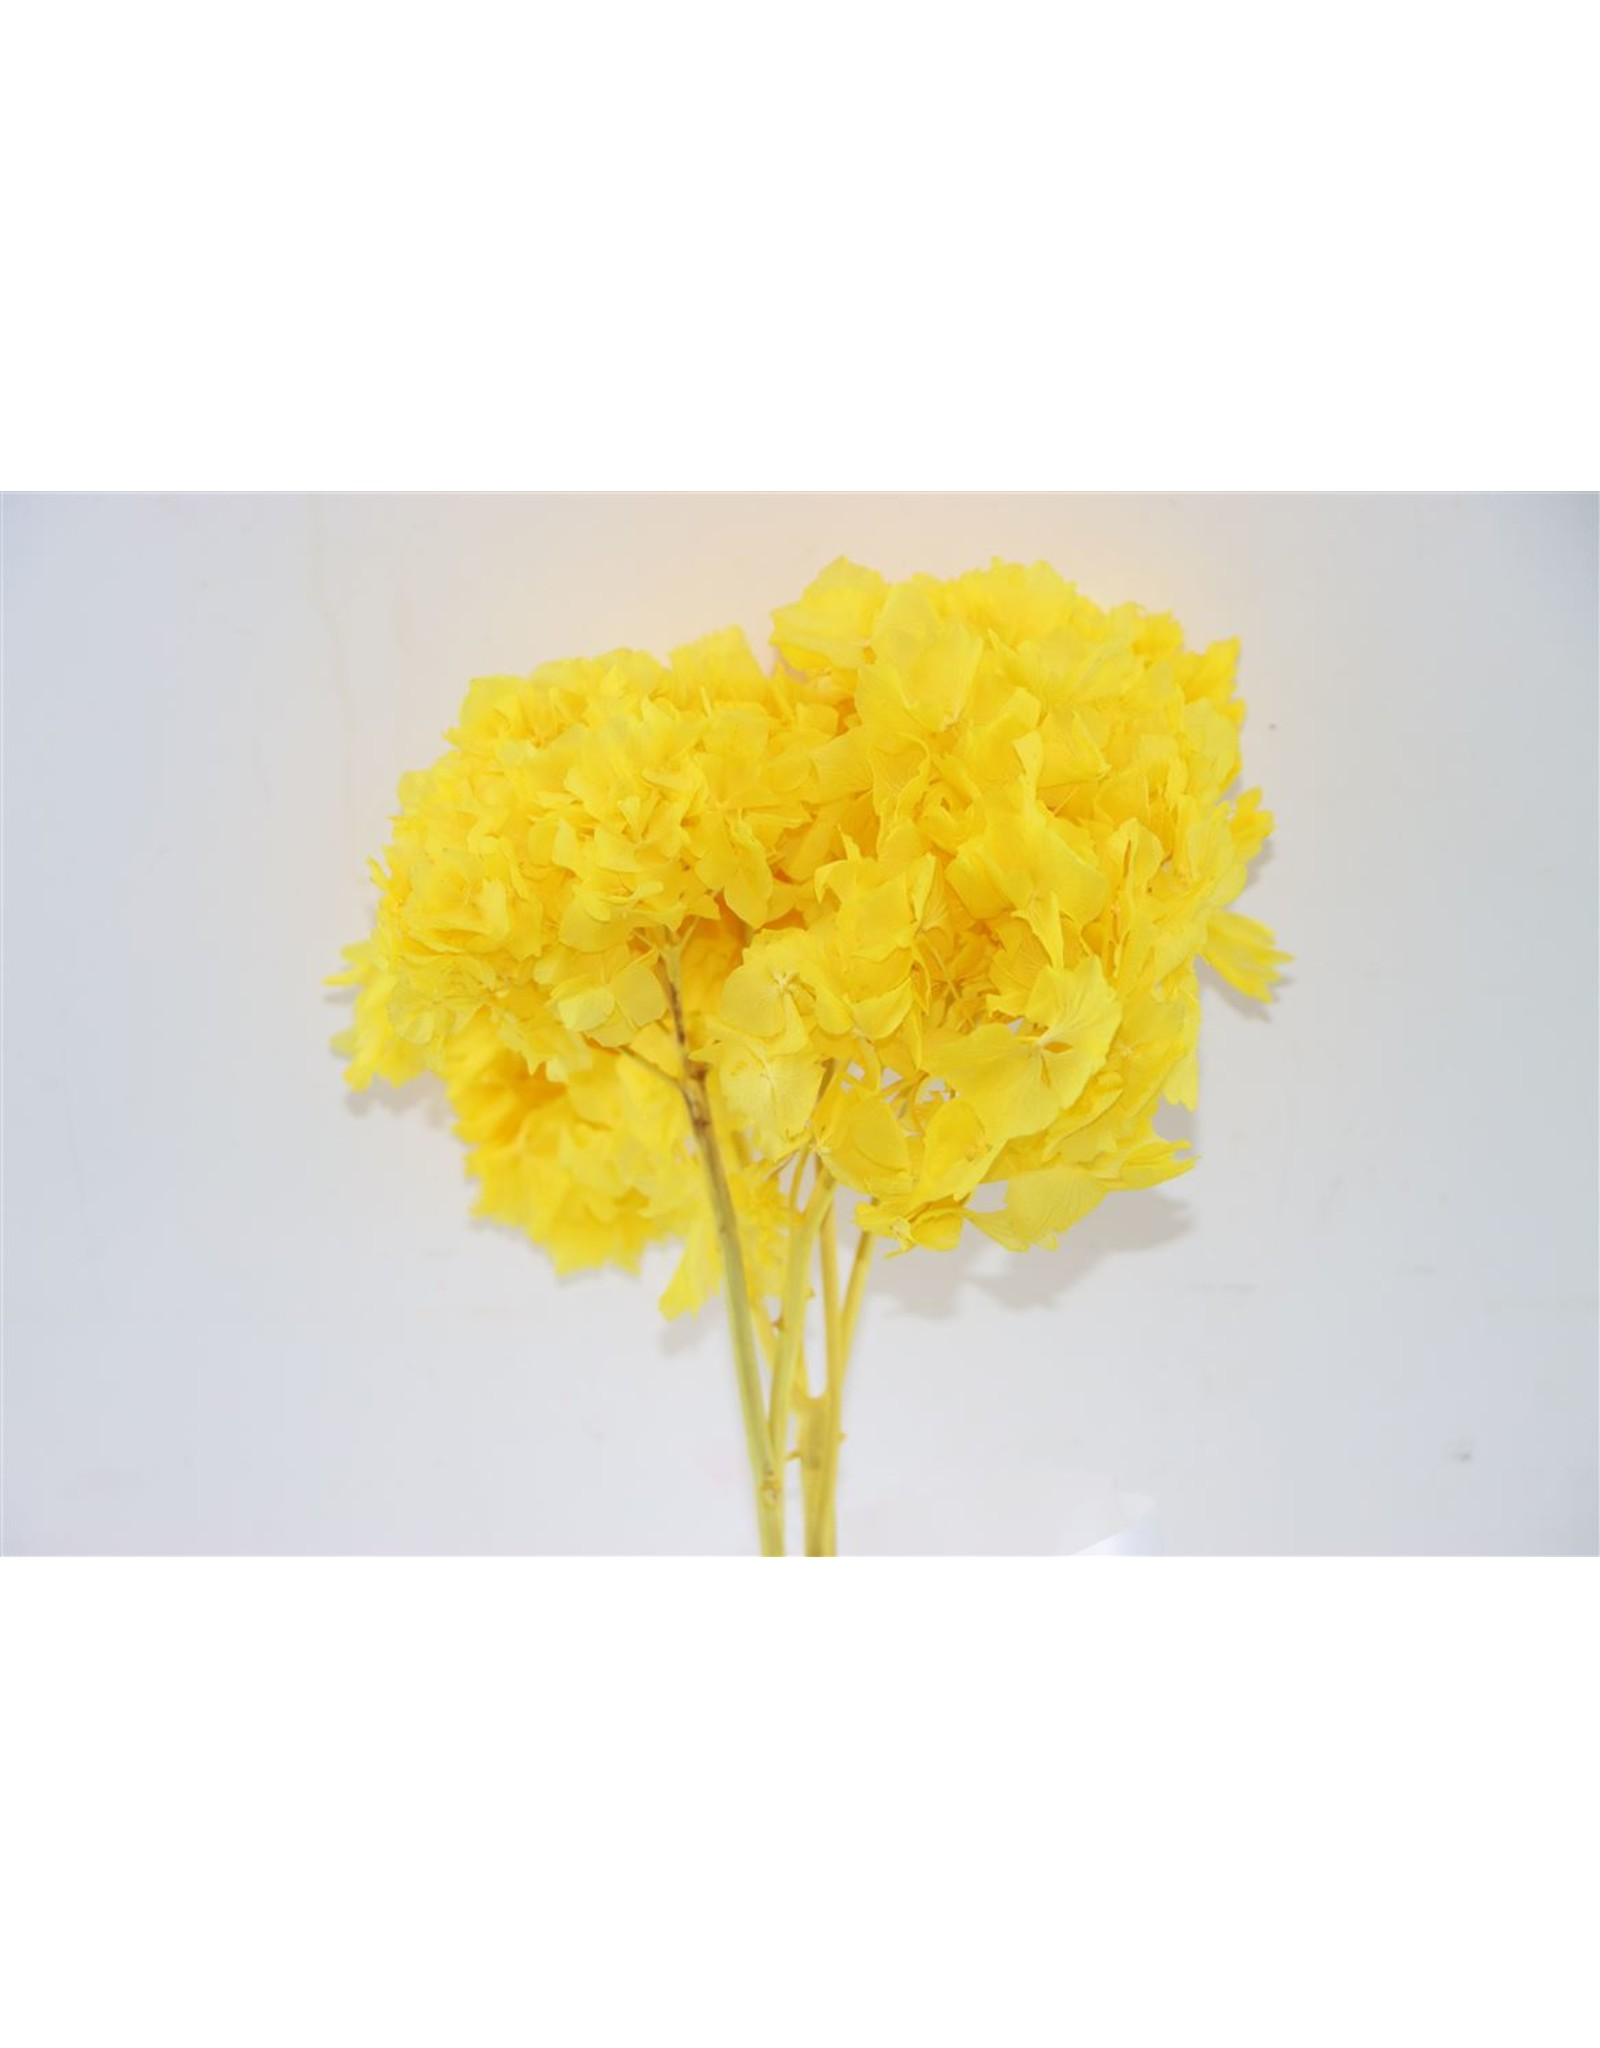 GF Dried Hydrangea Yellow Pro Bunch x 1